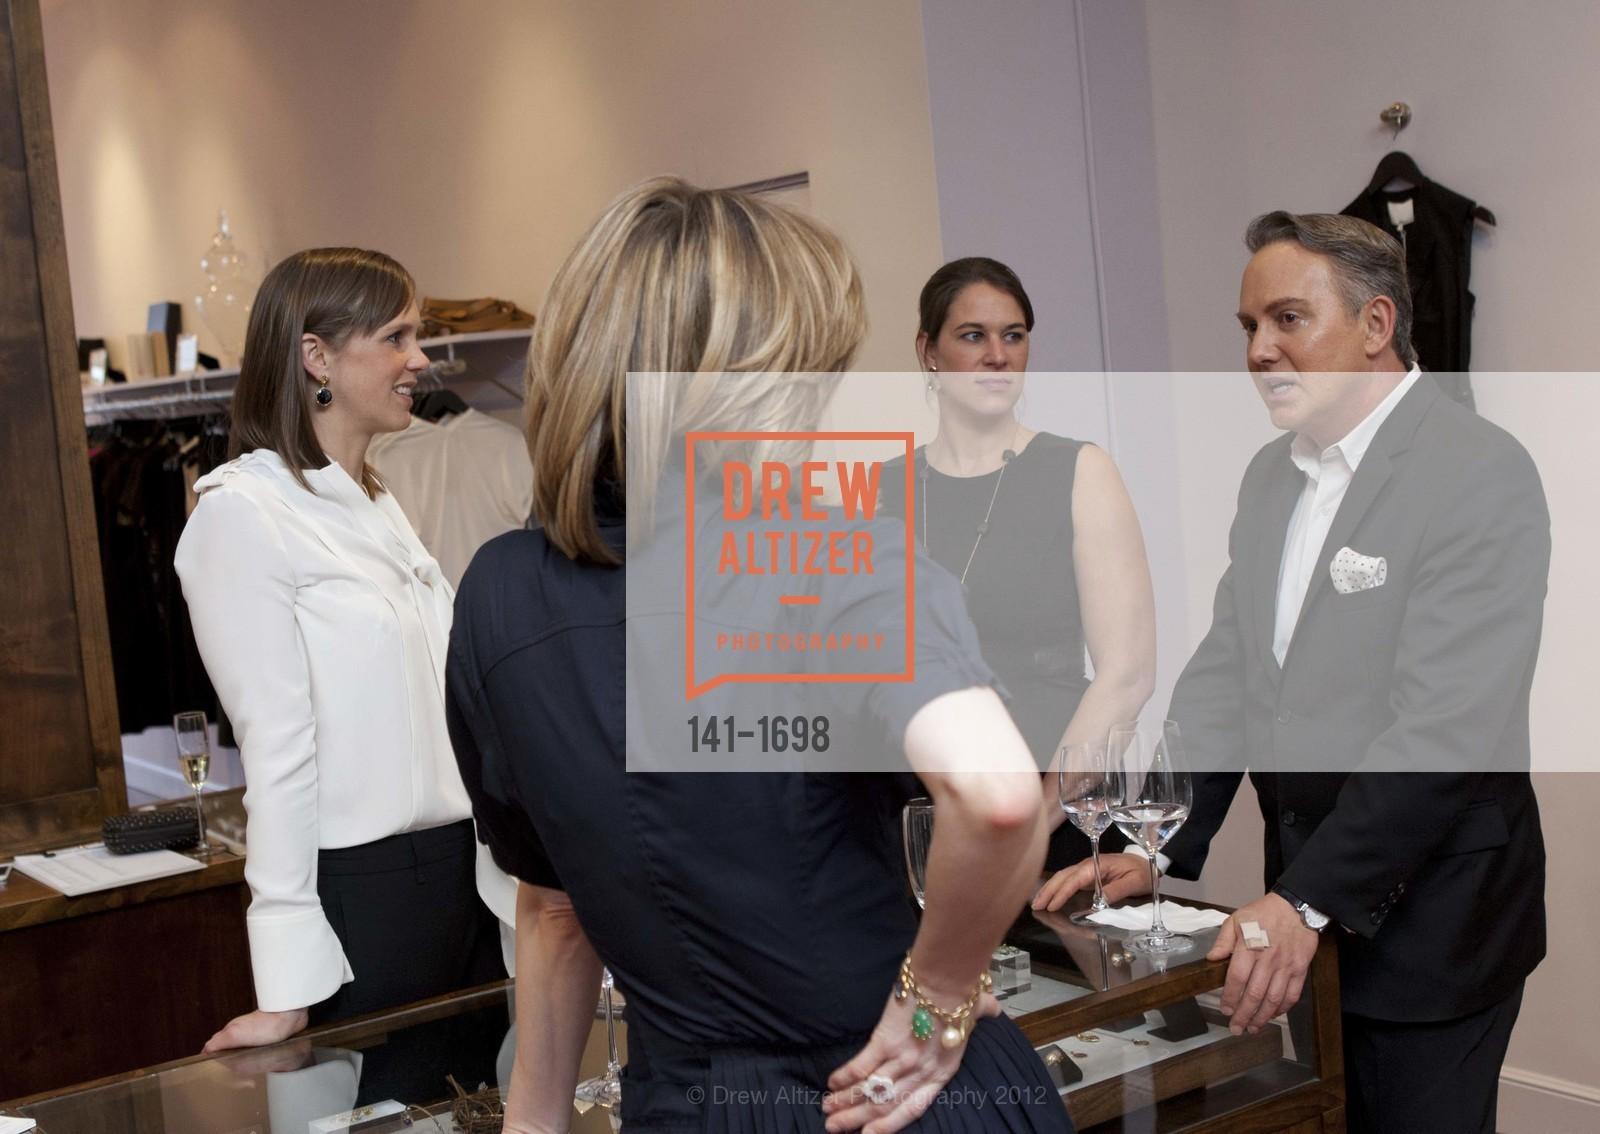 Kate Harbin, Jessica Moment, Daria de Koning, Joel Goodrich, Photo #141-1698